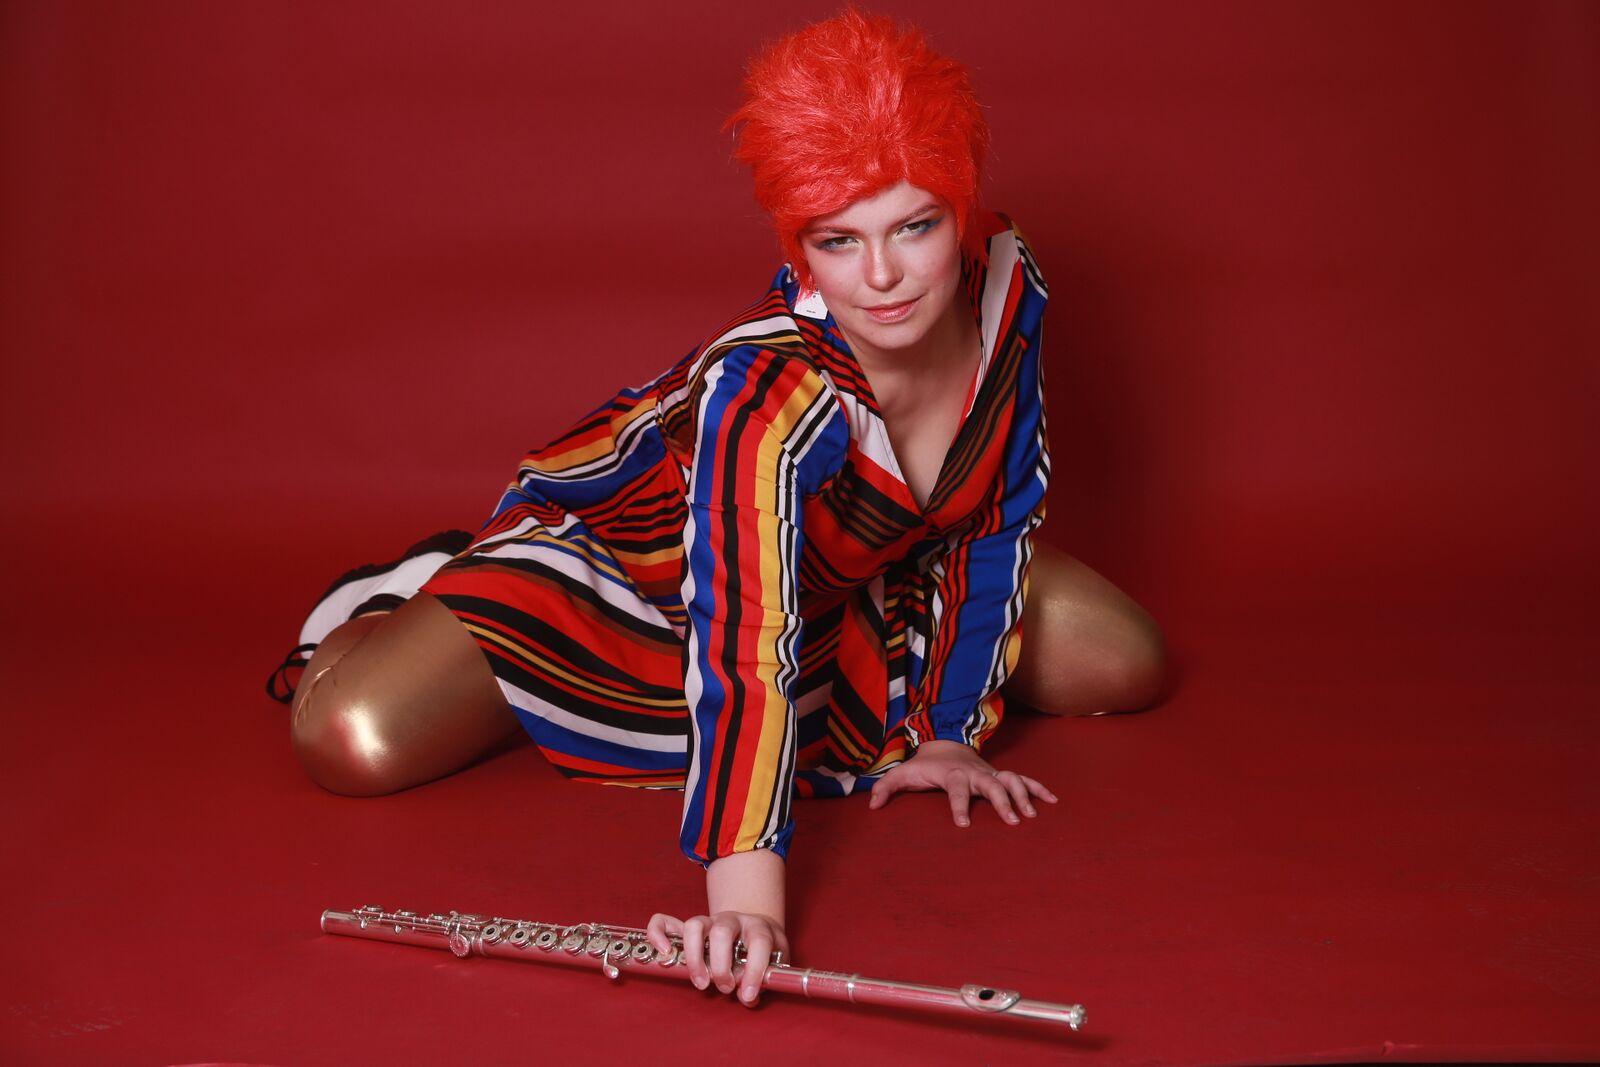 David Bowie ED_595.jpeg